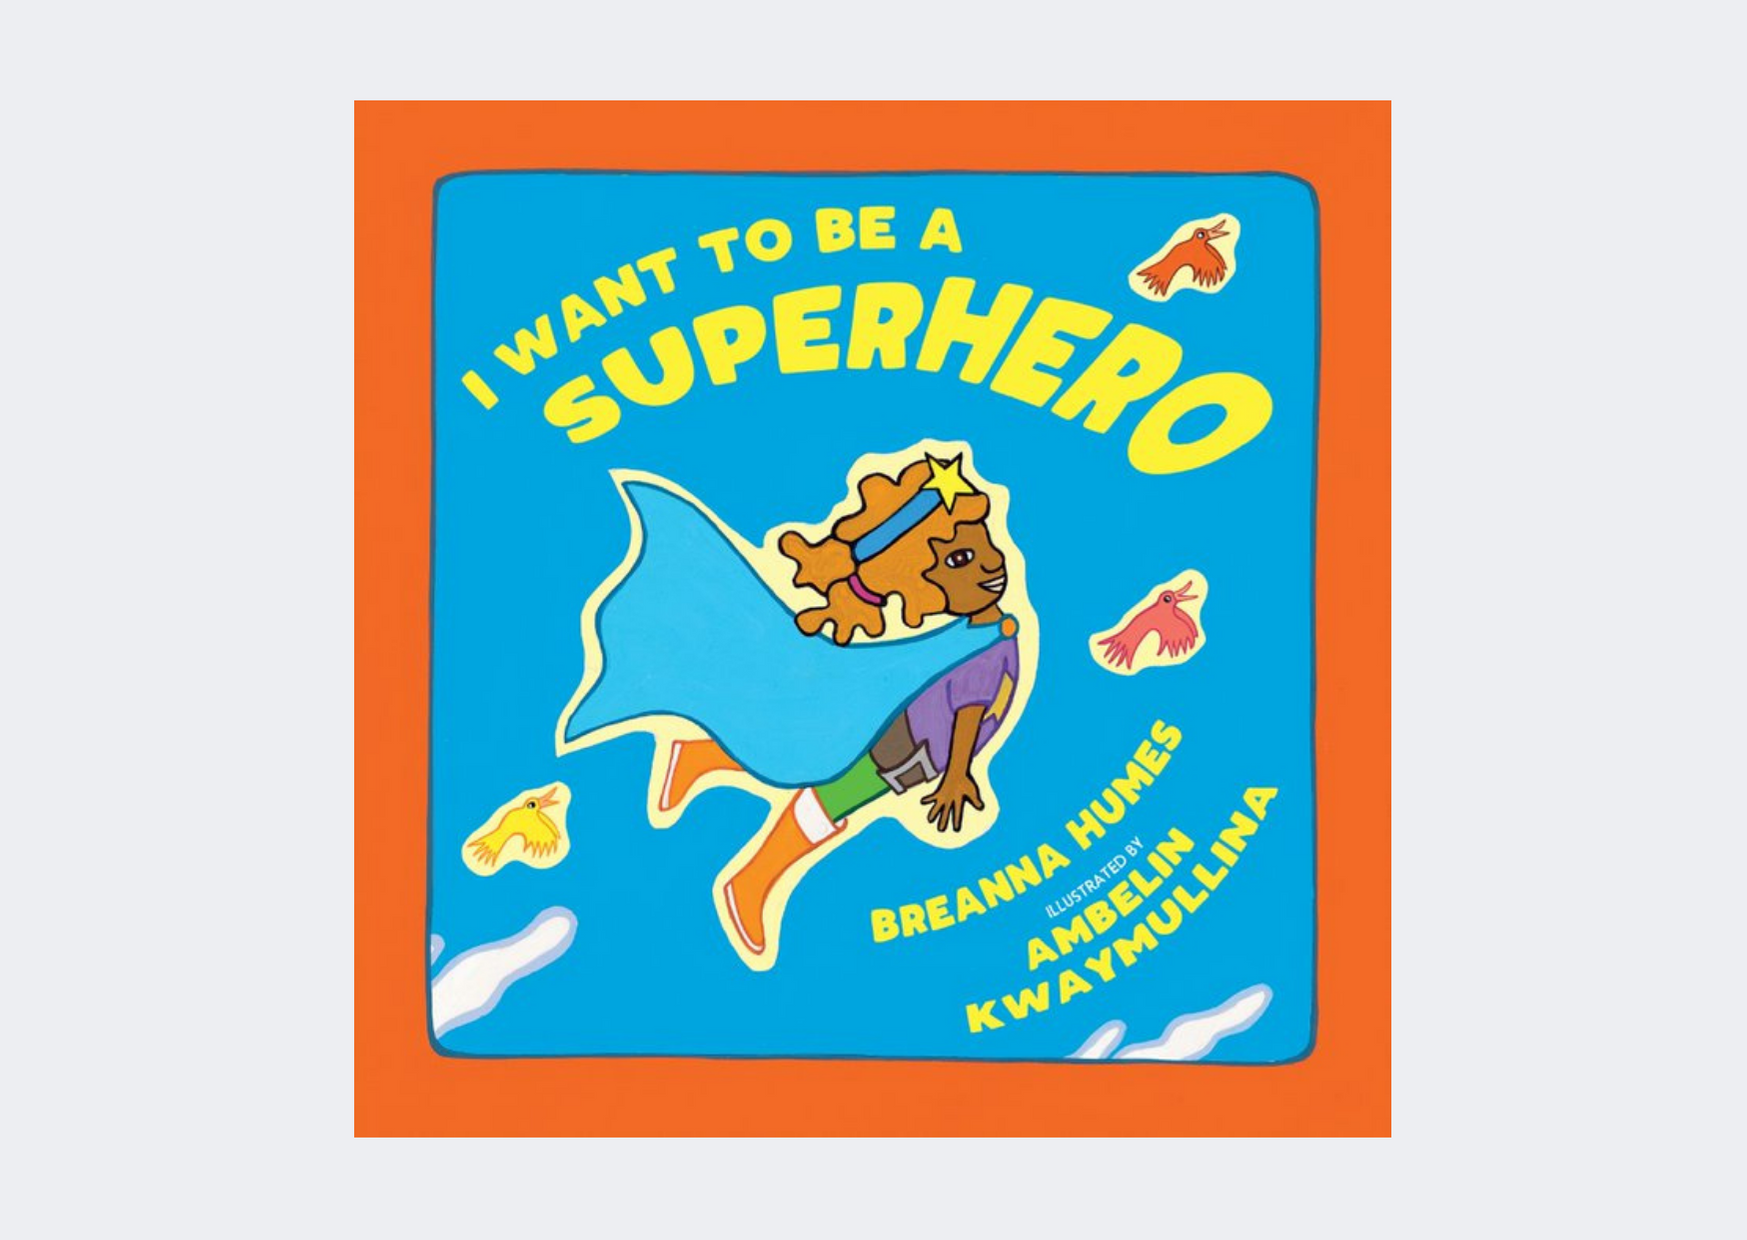 Magabala - I want to be a Superhero